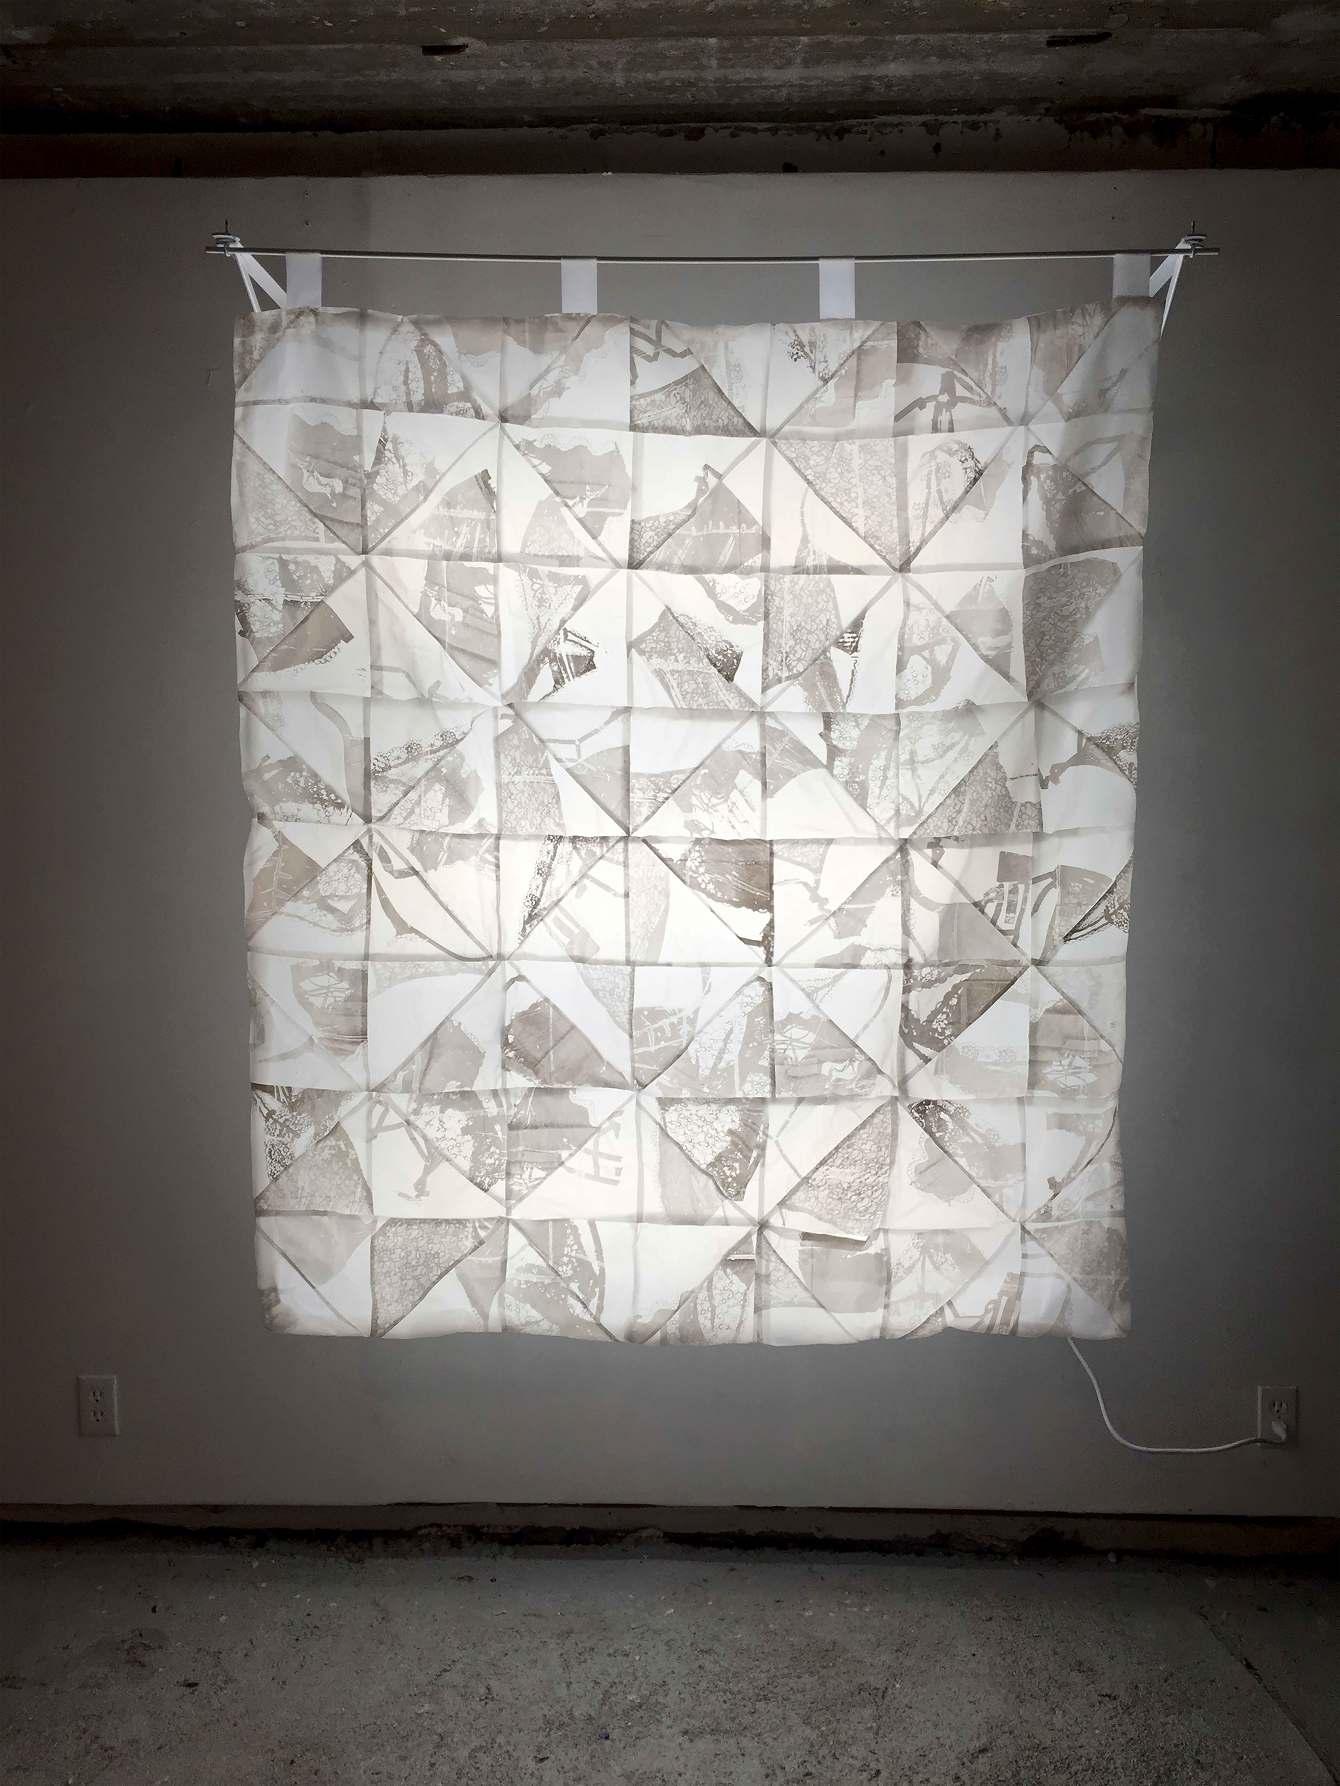 Schmiegelow offers insight into mixed media, performance art